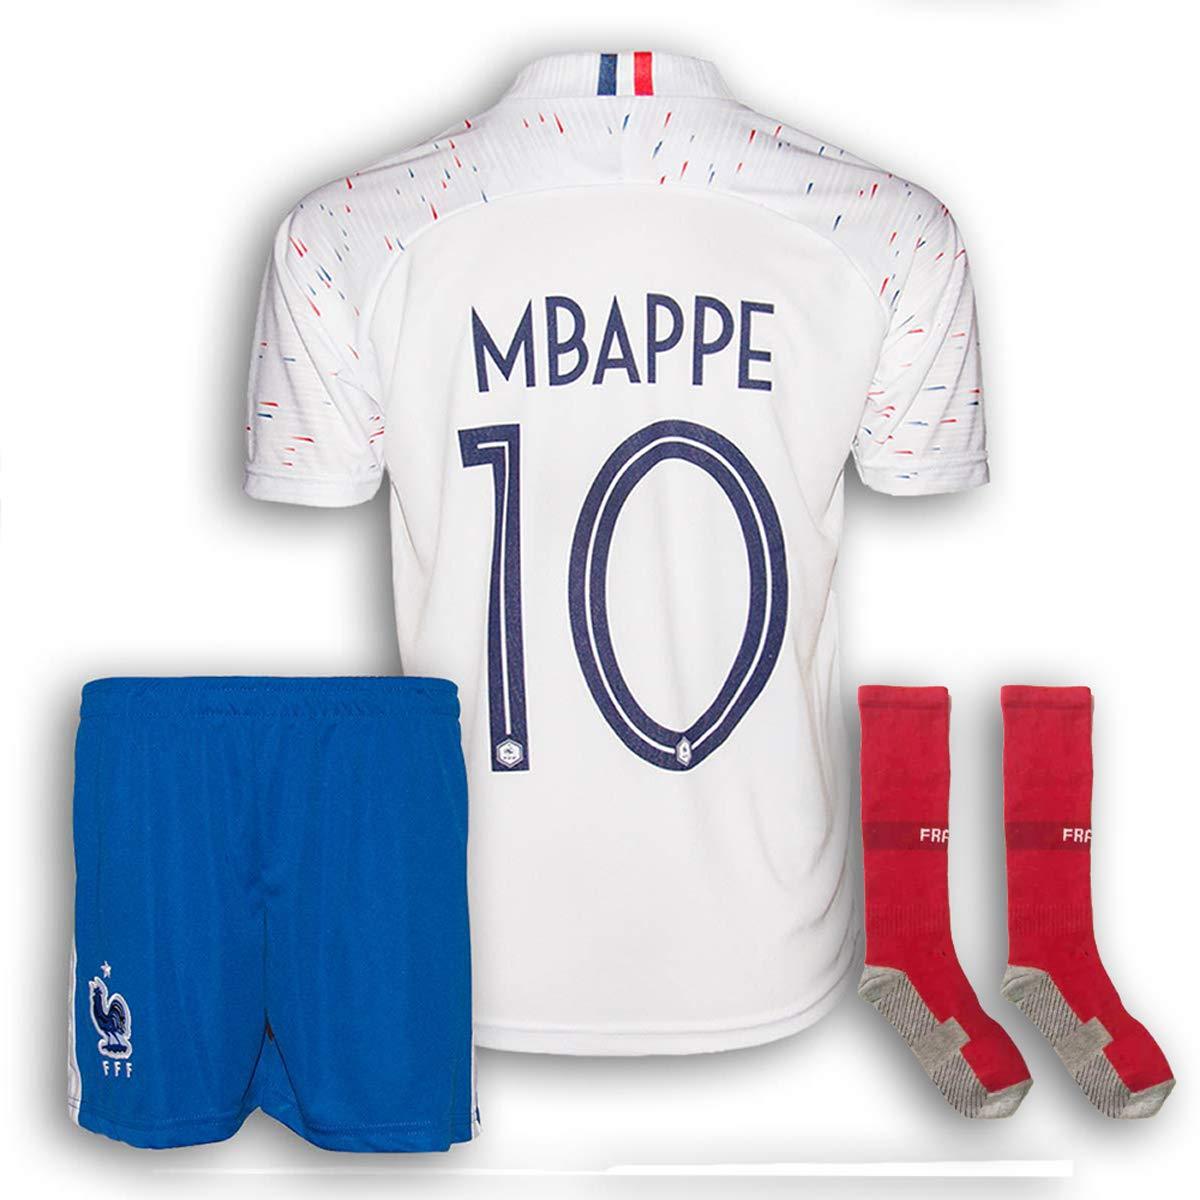 Frankreich Mbappe Trikot Set #10 2018//19 Ausw/ärts Mbappe Kinder Fussball Trikot Mit Shorts